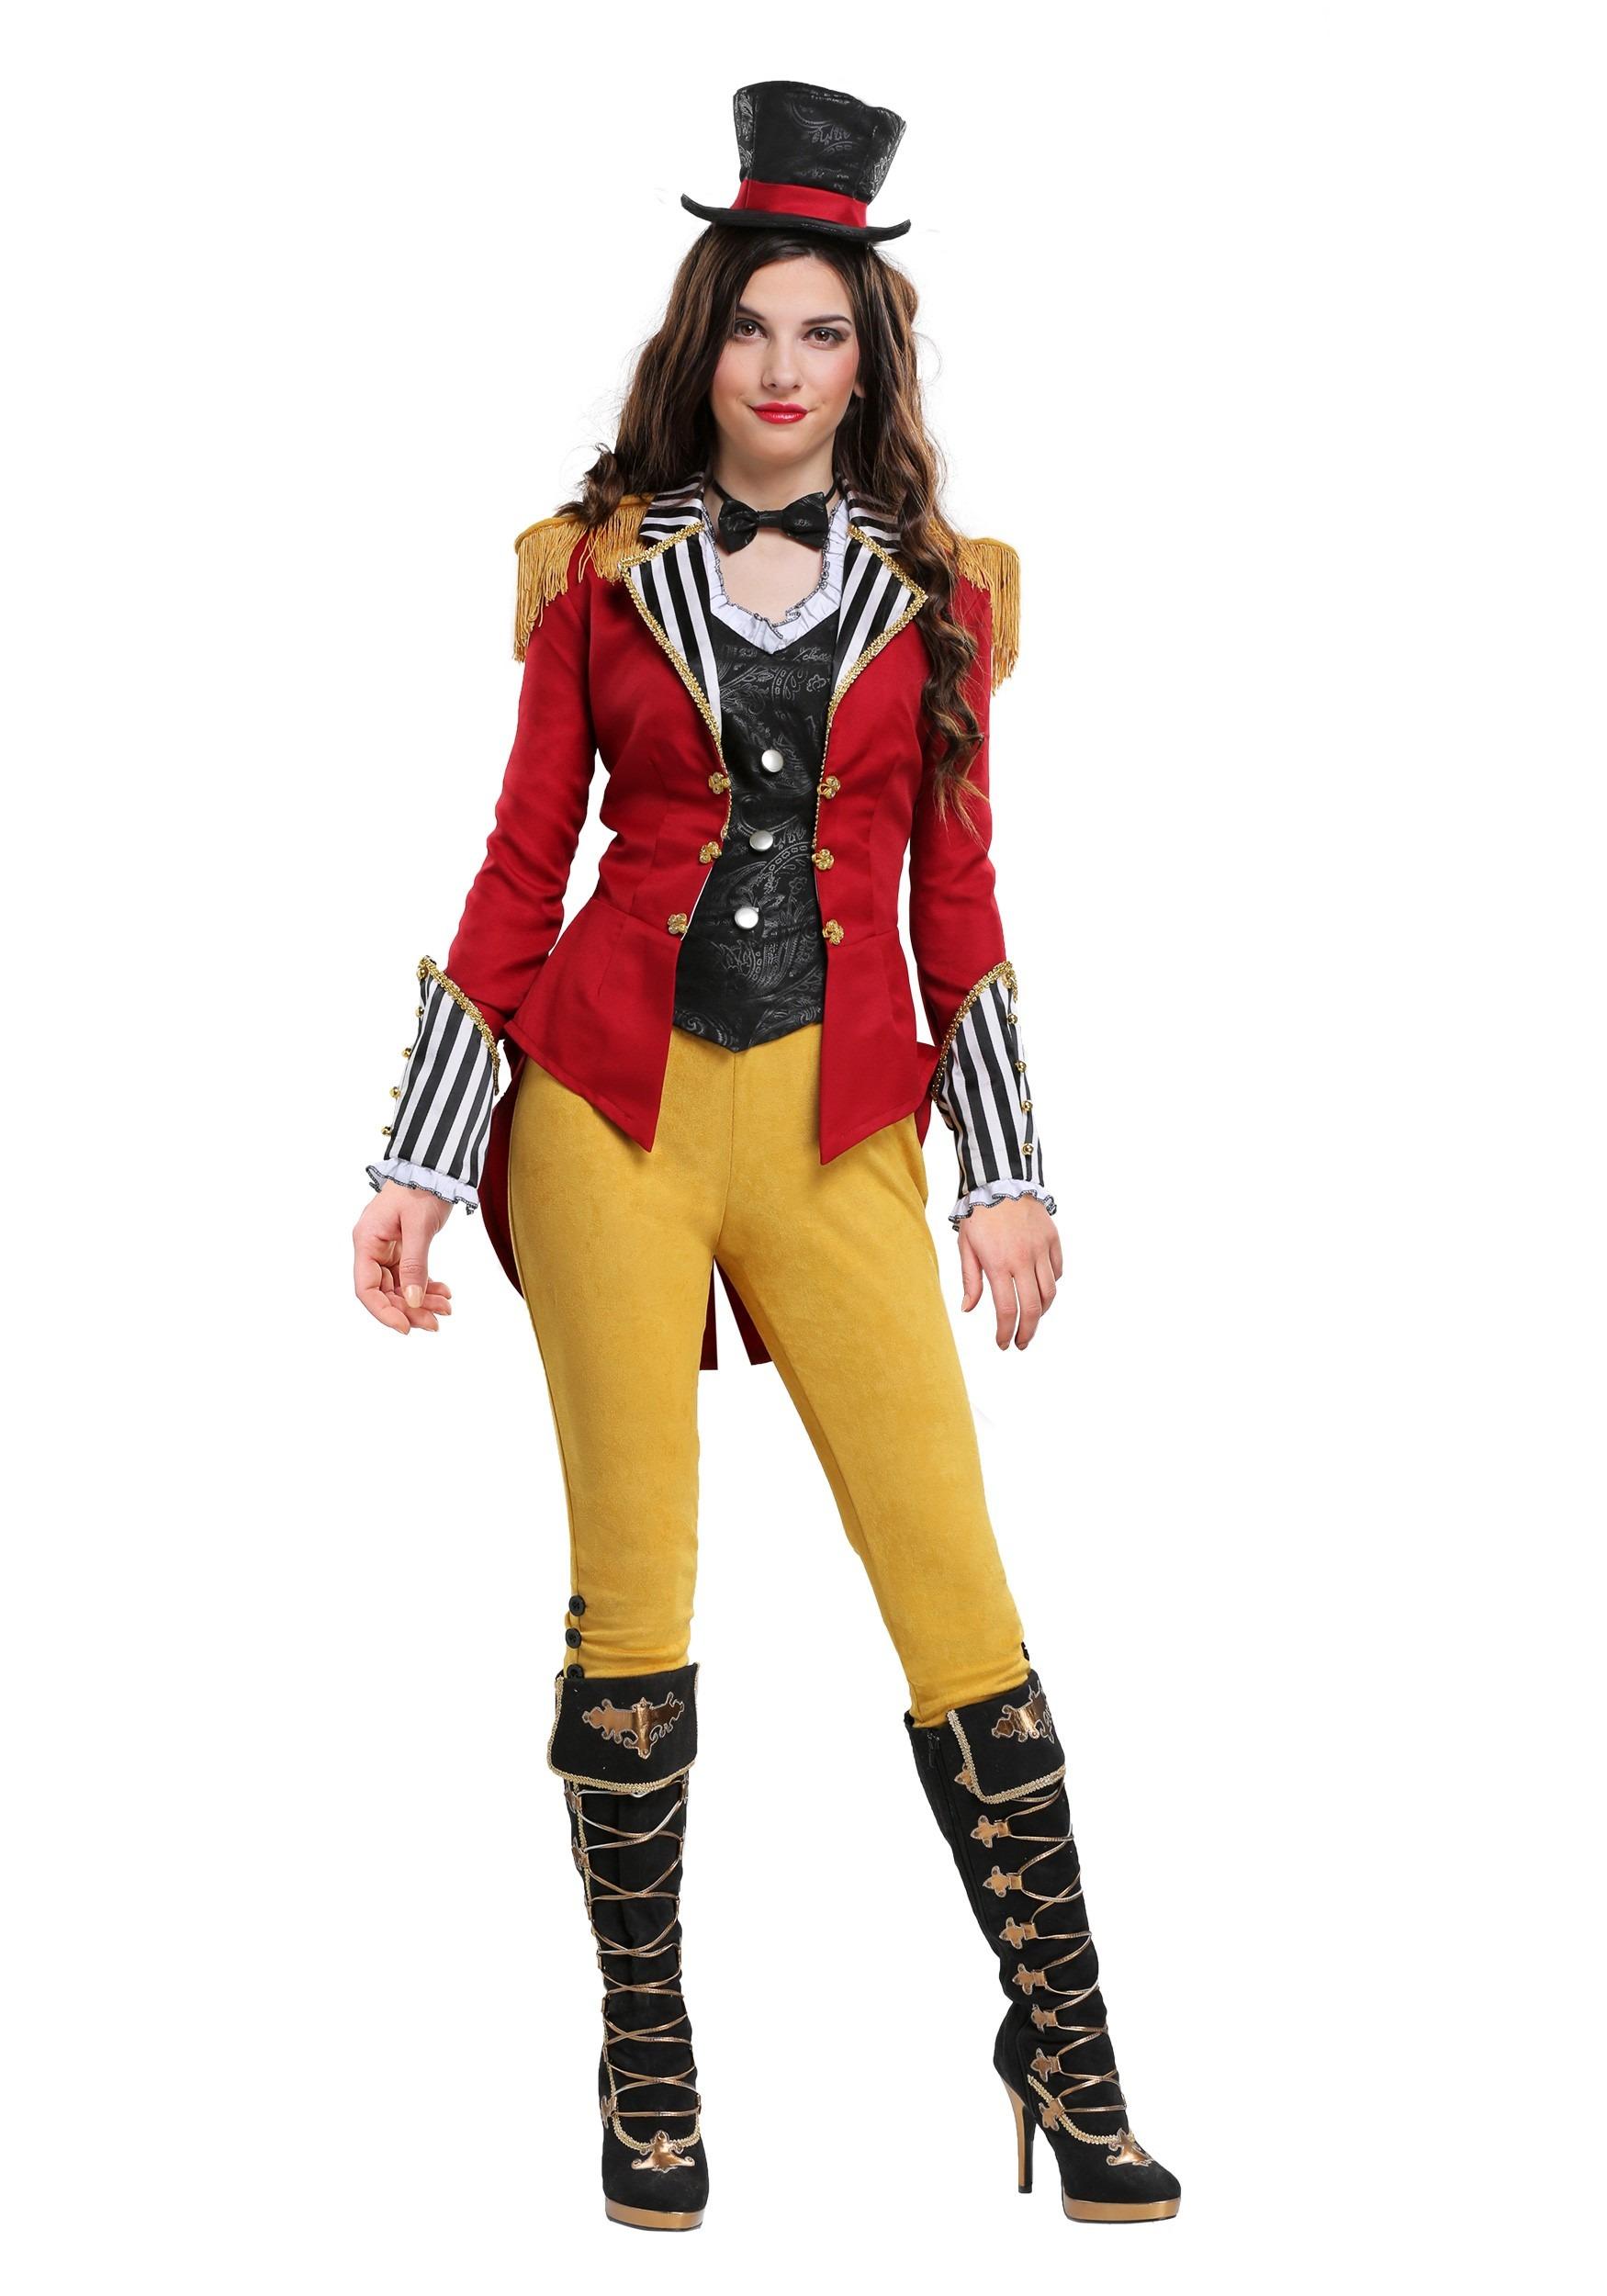 Ravishing Ringmaster Plus Size Costume for Women 1X 2X